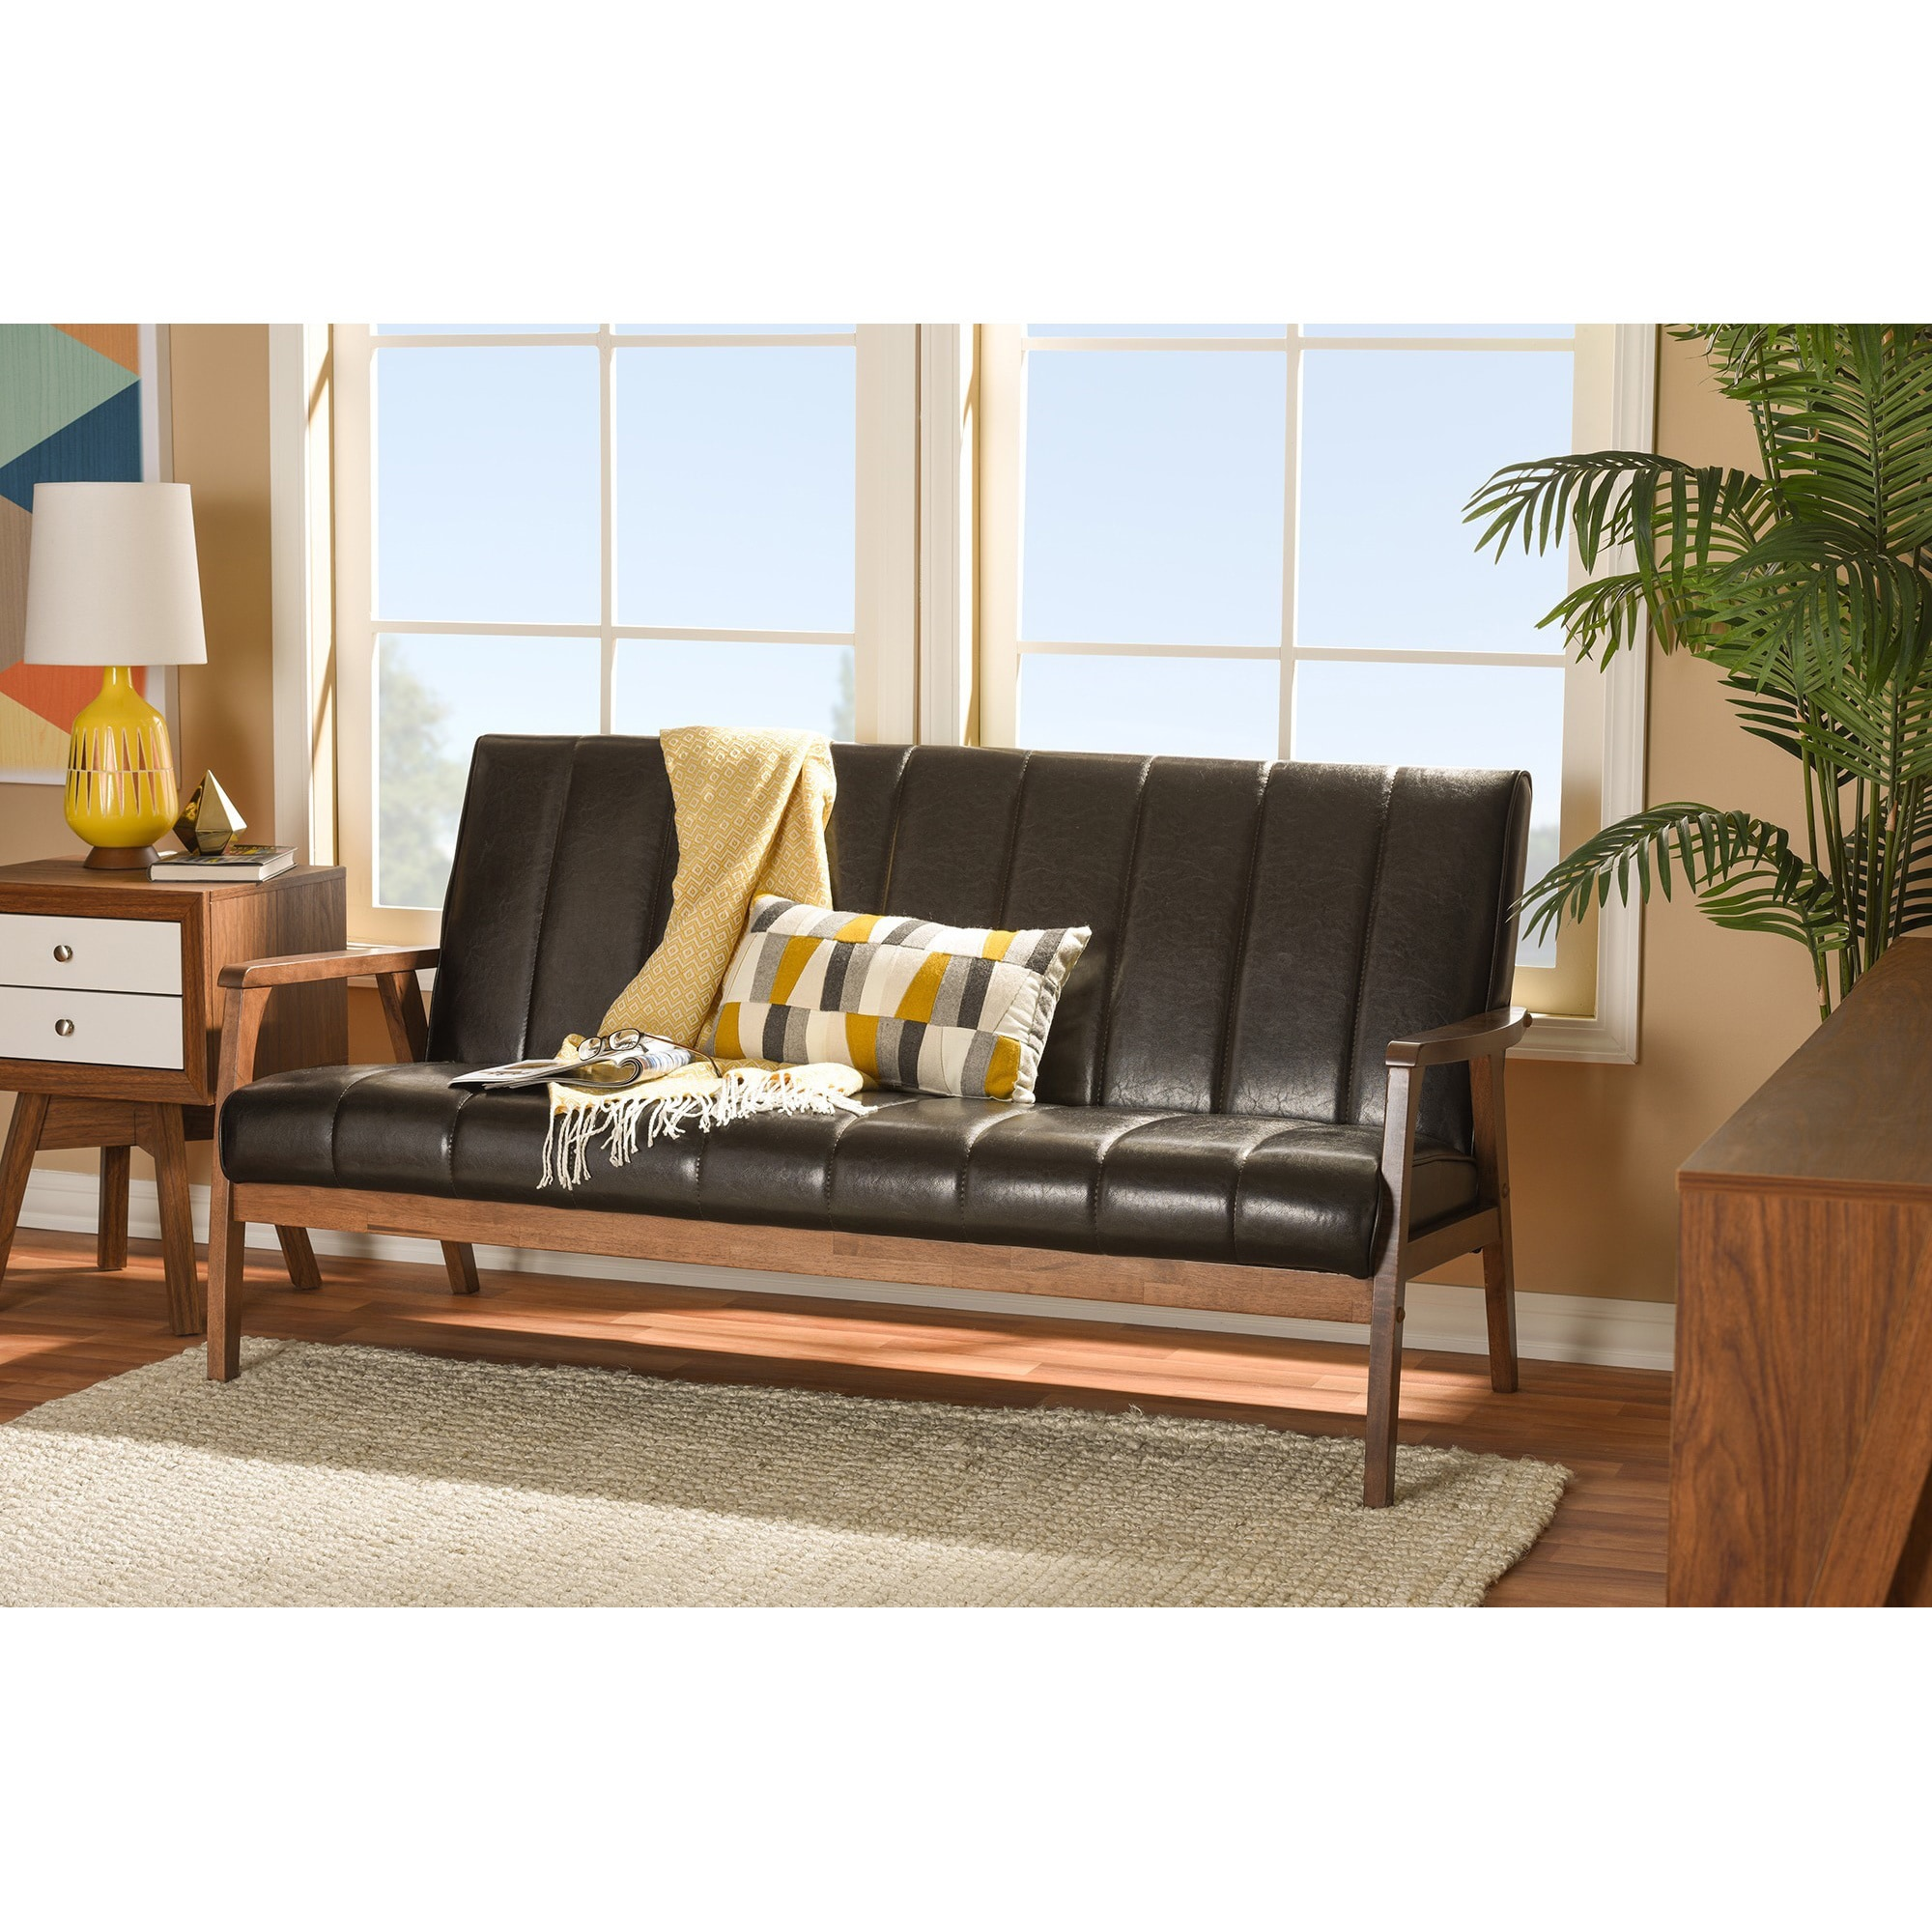 Baxton Studio Nikko Mid-century Modern Scandinavian Style Dark Brown Faux  Leather Wooden 3-Seater Sofa